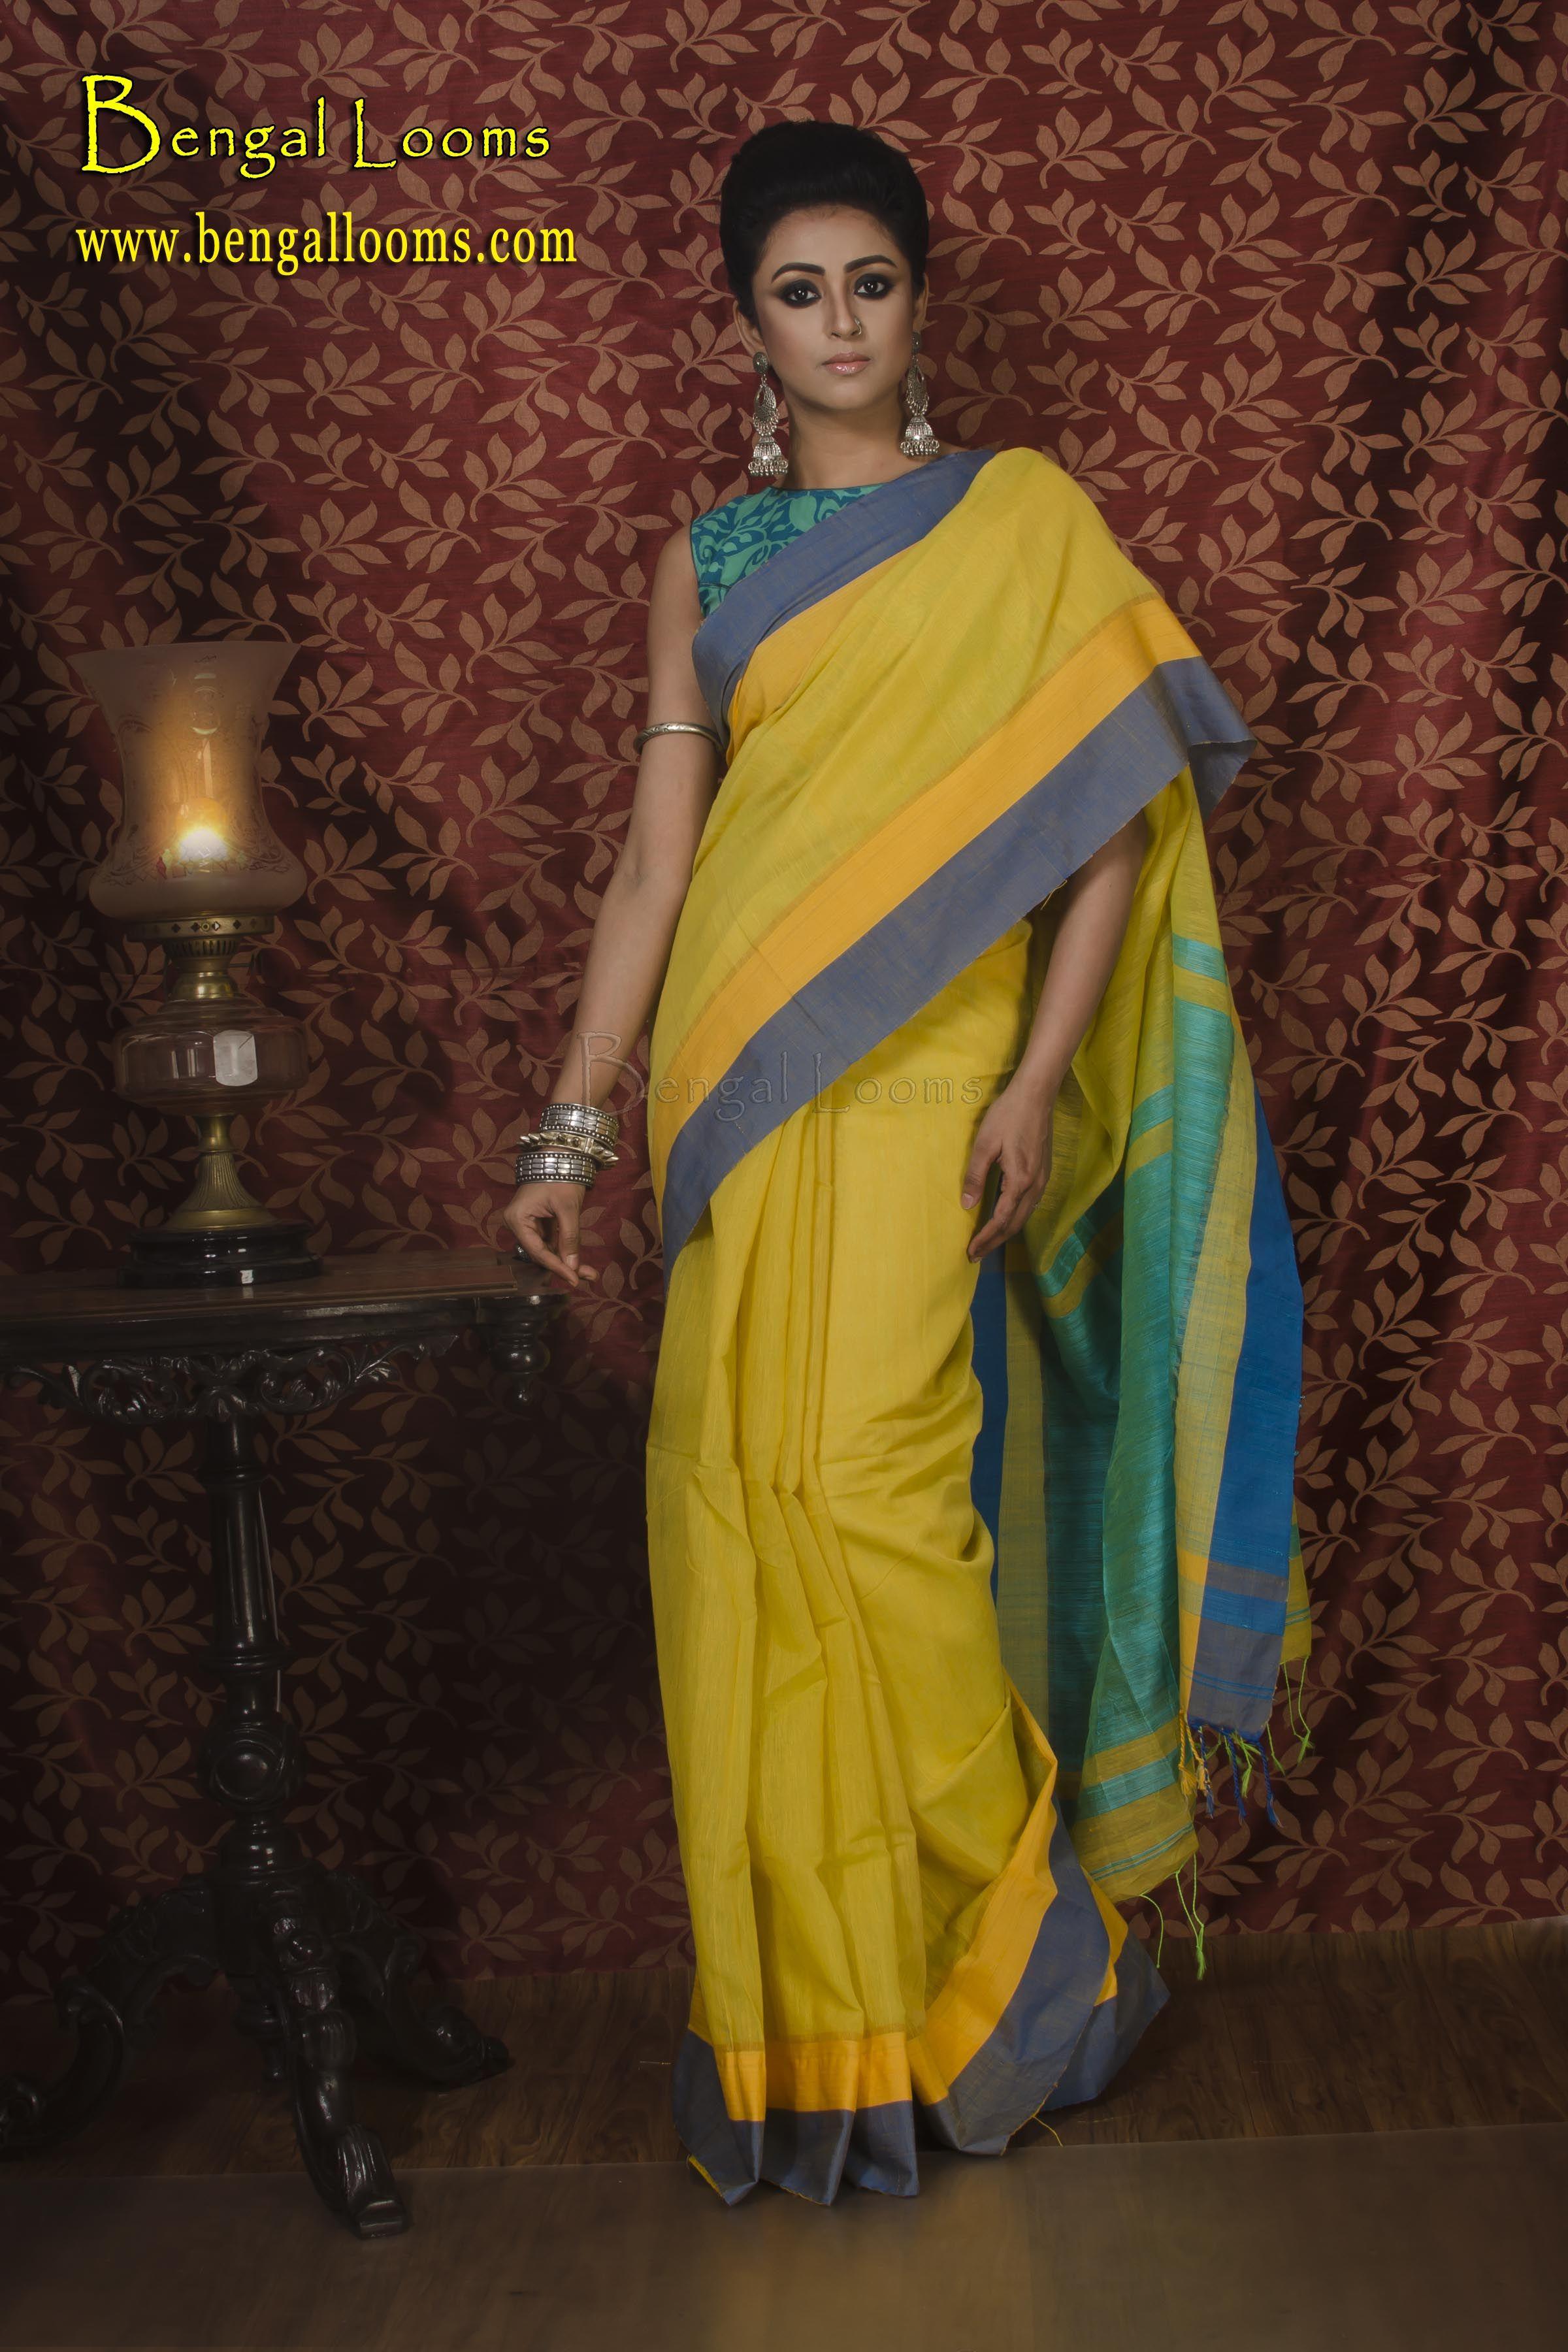 886342e5f3b727 Khadi Soft Cotton Saree in Yellow and Green | Khadi Sarees in 2019 ...